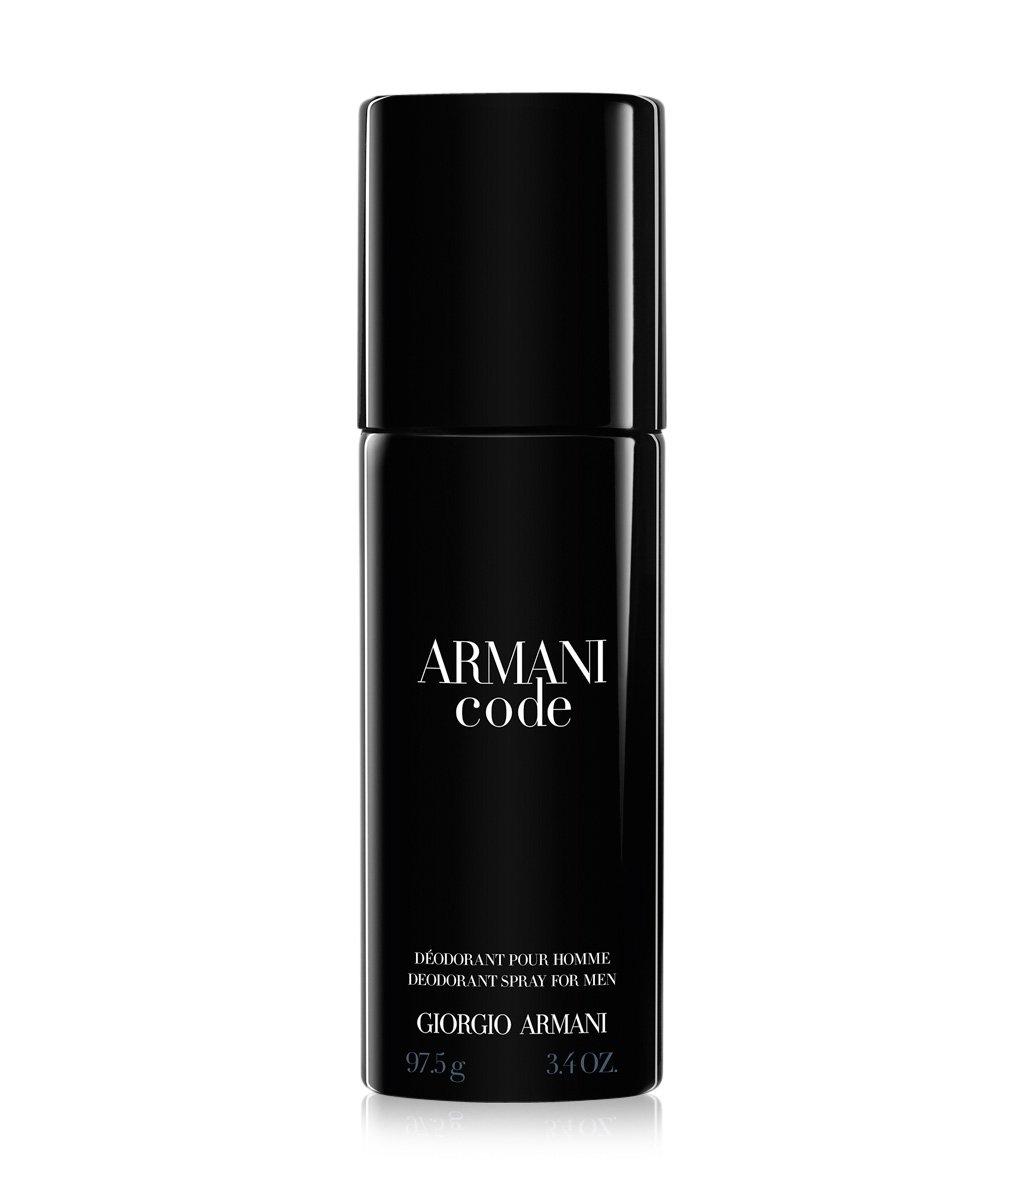 giorgio armani code homme deodorant spray bestellen flaconi. Black Bedroom Furniture Sets. Home Design Ideas